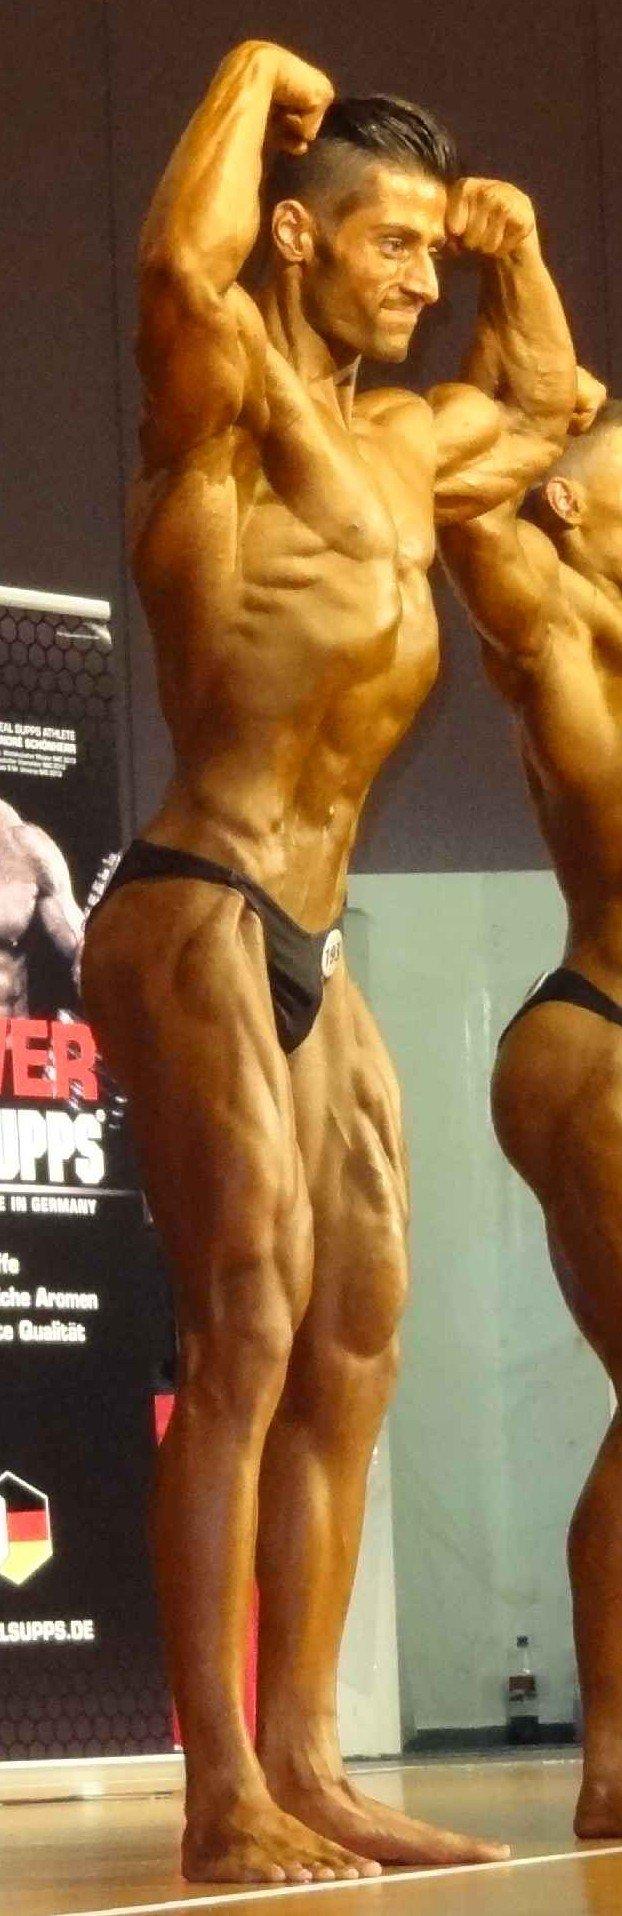 Bahadori_Sepehr_Junioren_Gewinner_Bodybuilding